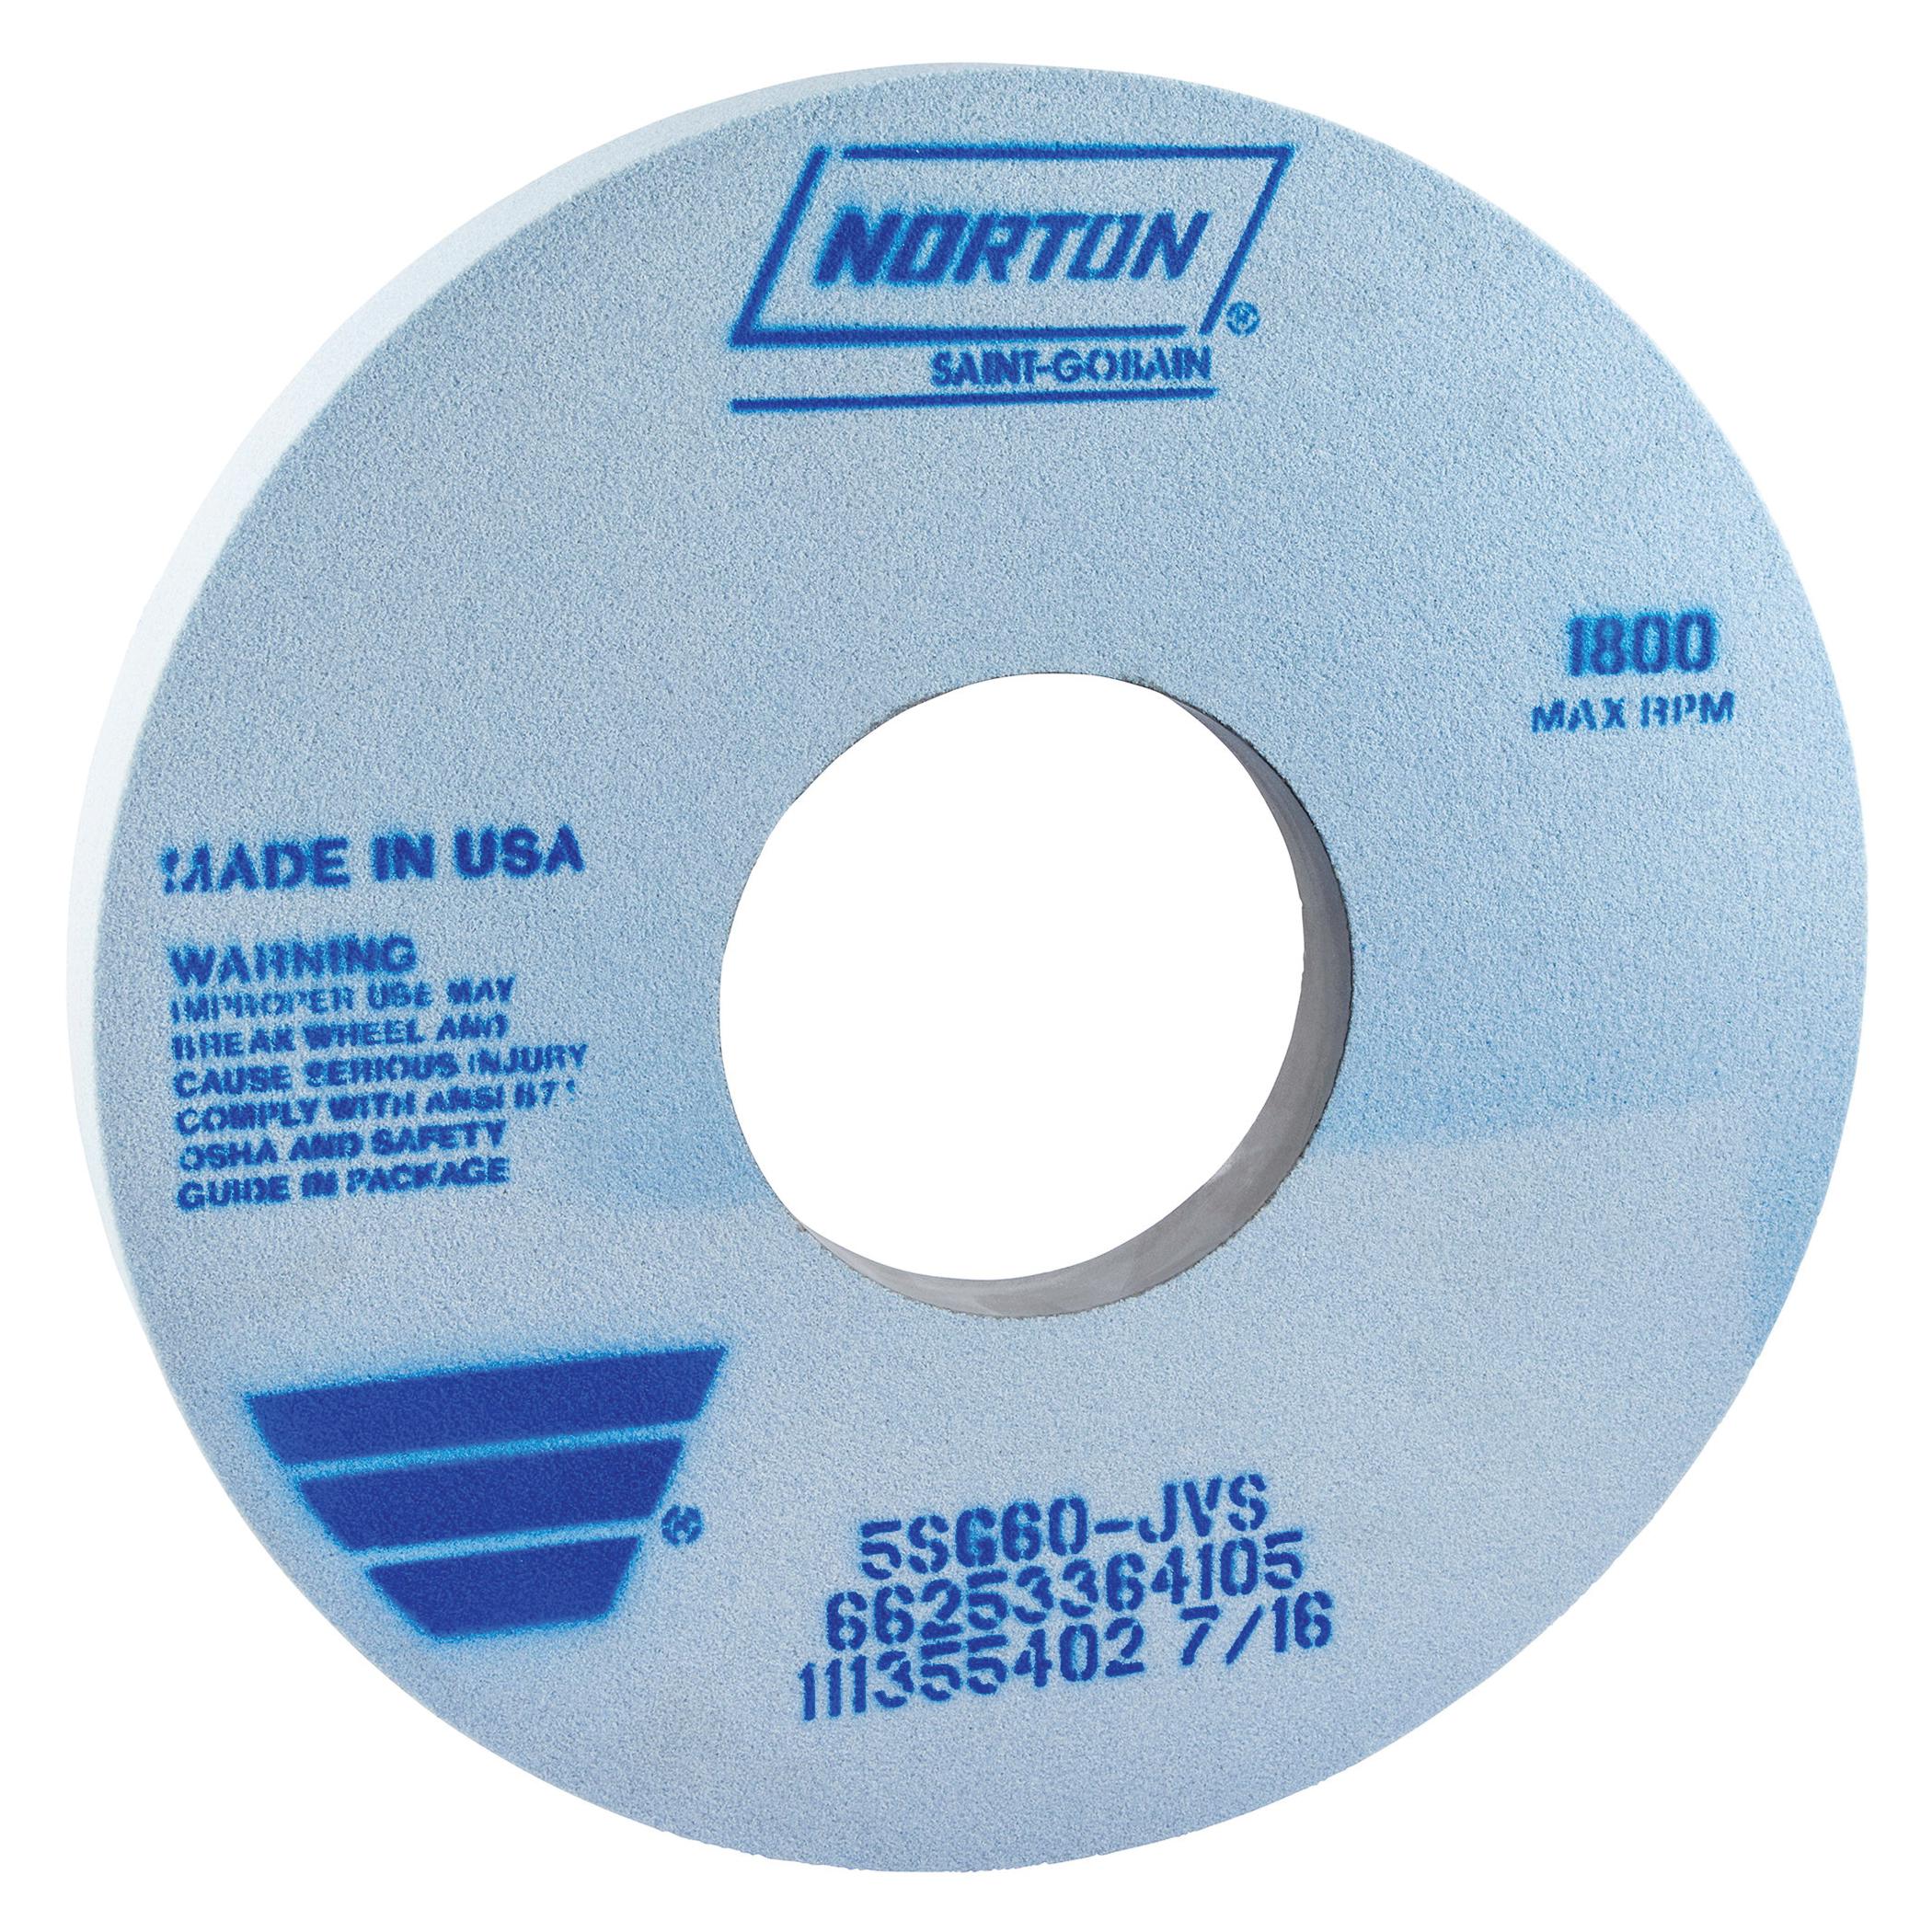 Norton® 66253364103 5SG 1-Side Recessed Toolroom Wheel, 14 in Dia x 1-1/2 in THK, 5 in Center Hole, 46 Grit, Ceramic Alumina/Friable Aluminum Oxide Abrasive